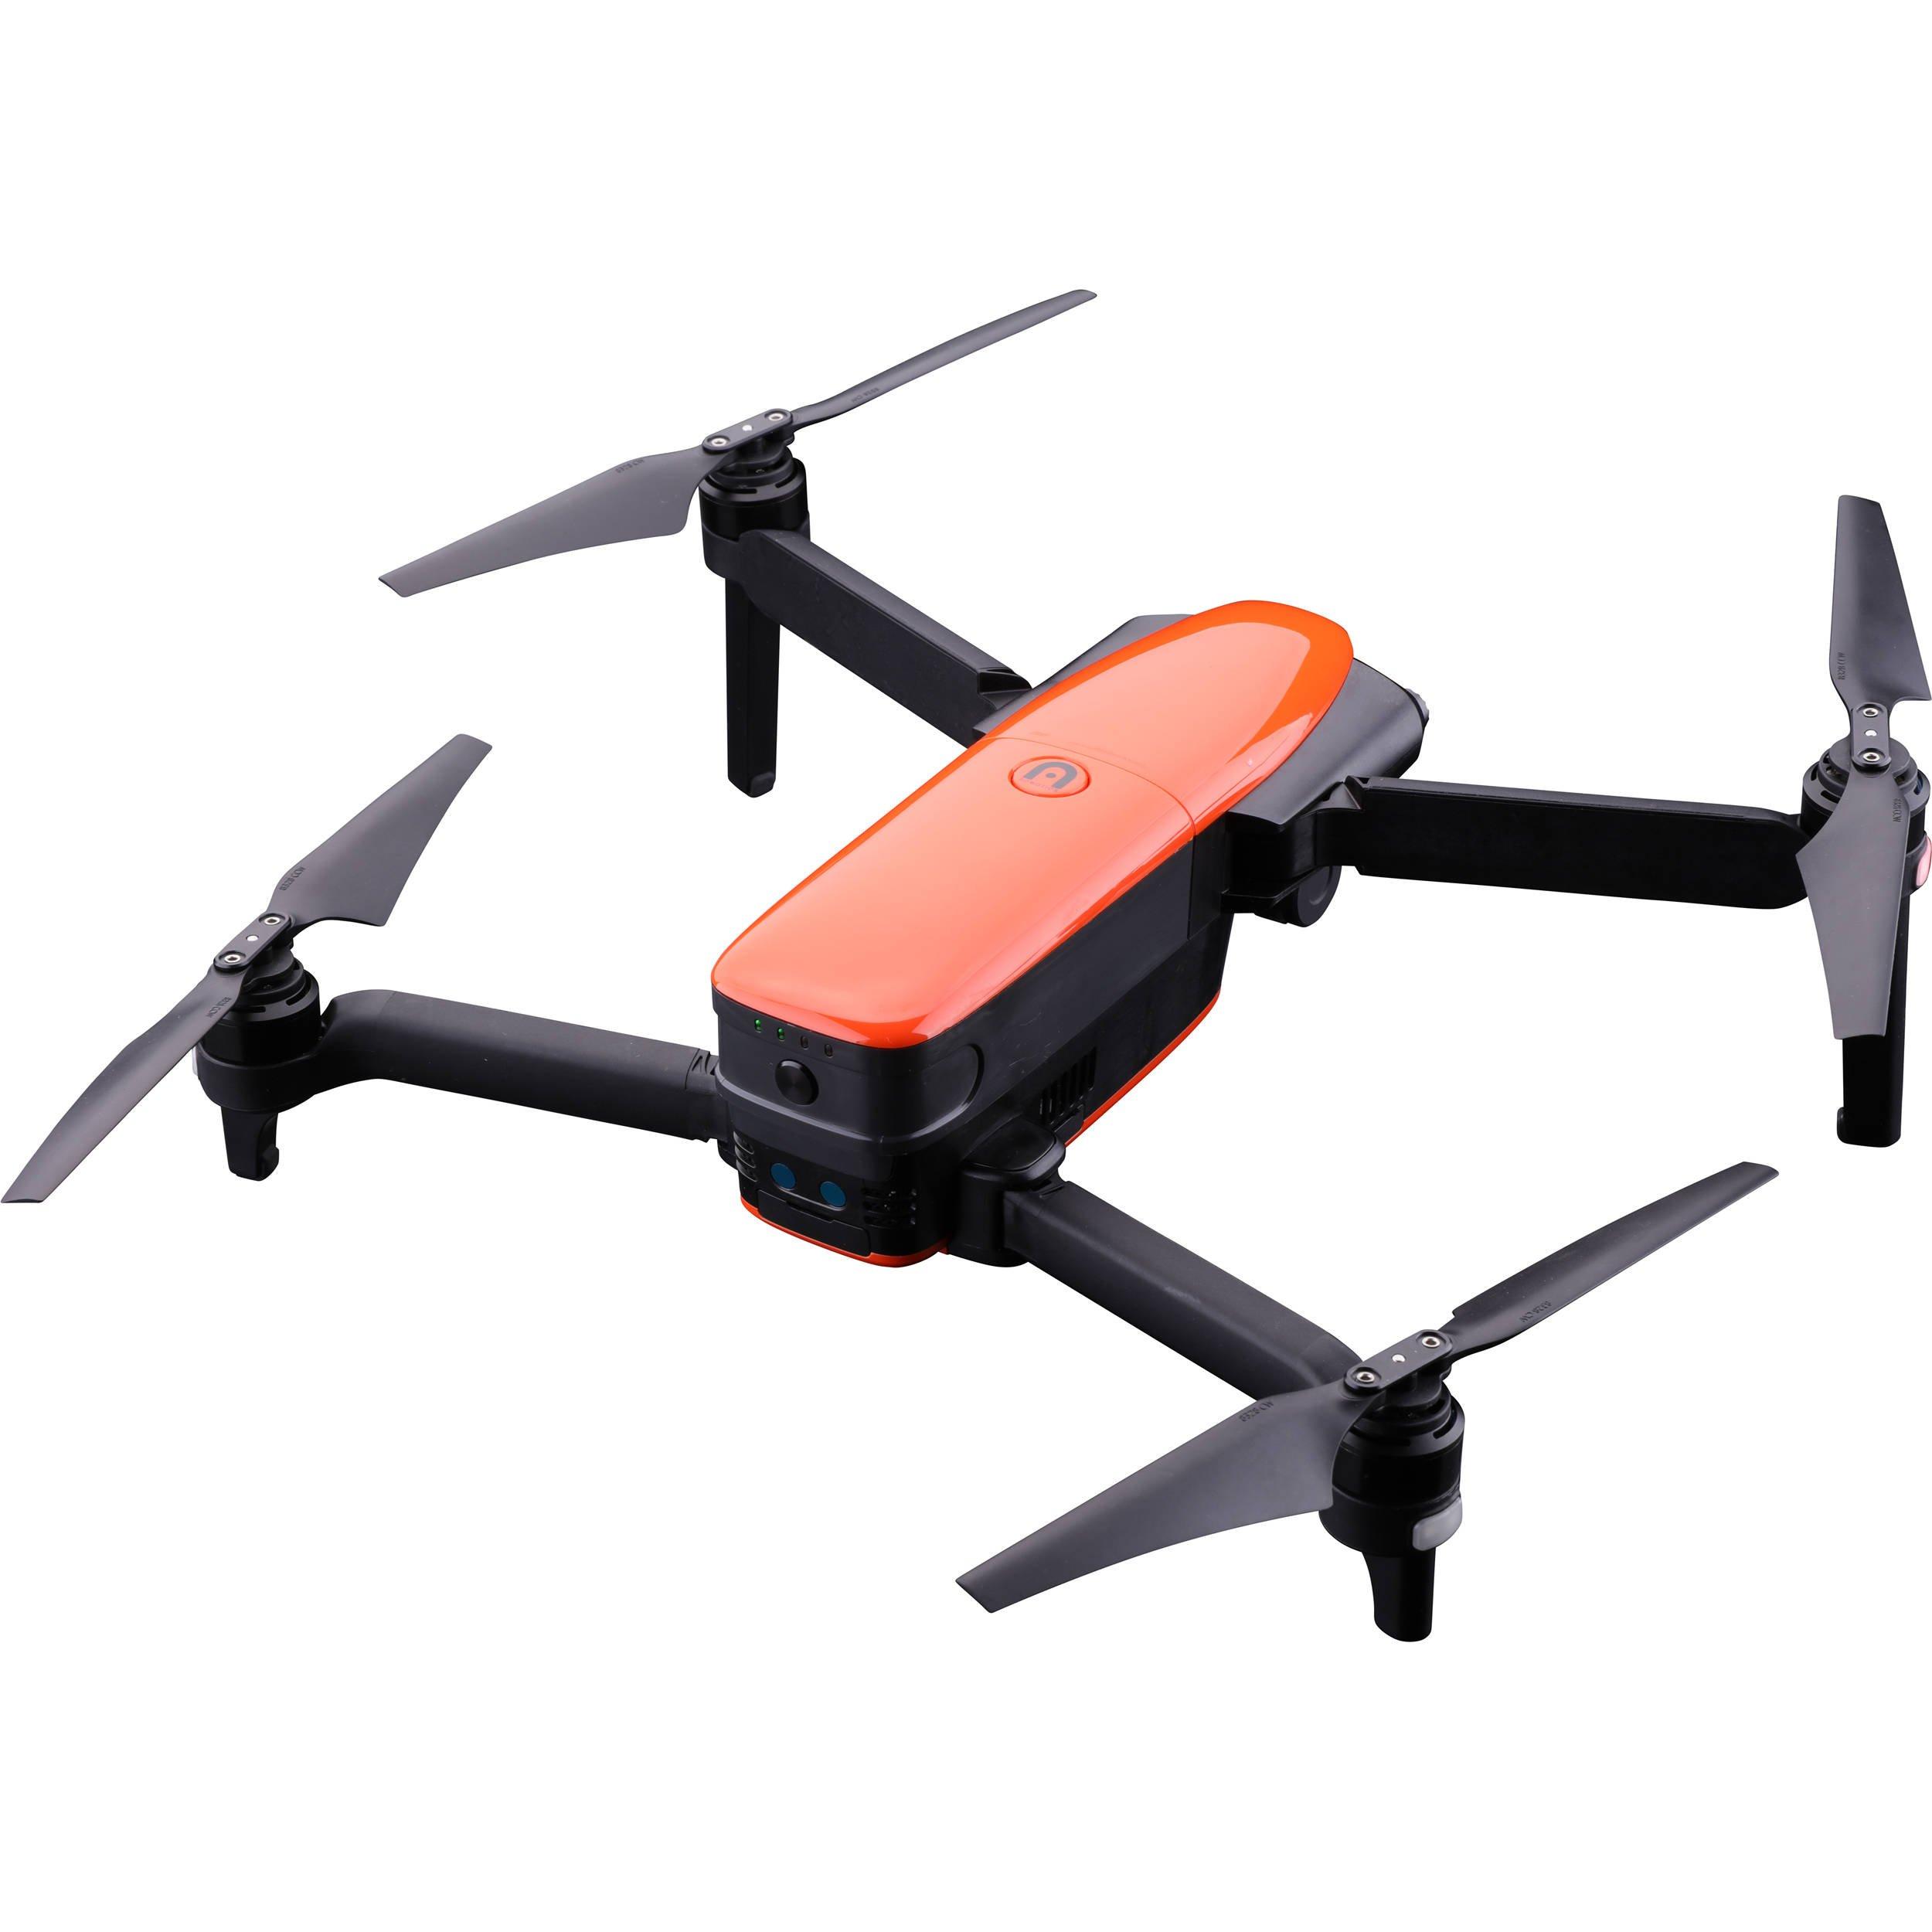 Autel Robotics EVO Quadcopter + Autel Robotics 4300mAh Intelligent LiPo Battery + Travel Bag for EVO + 64GB microSDXC + VR VUE: 3D Virtual Reality Viewer + Card Reader + Deluxe Cleaning Kit Bundle by Autel Robotics (Image #4)